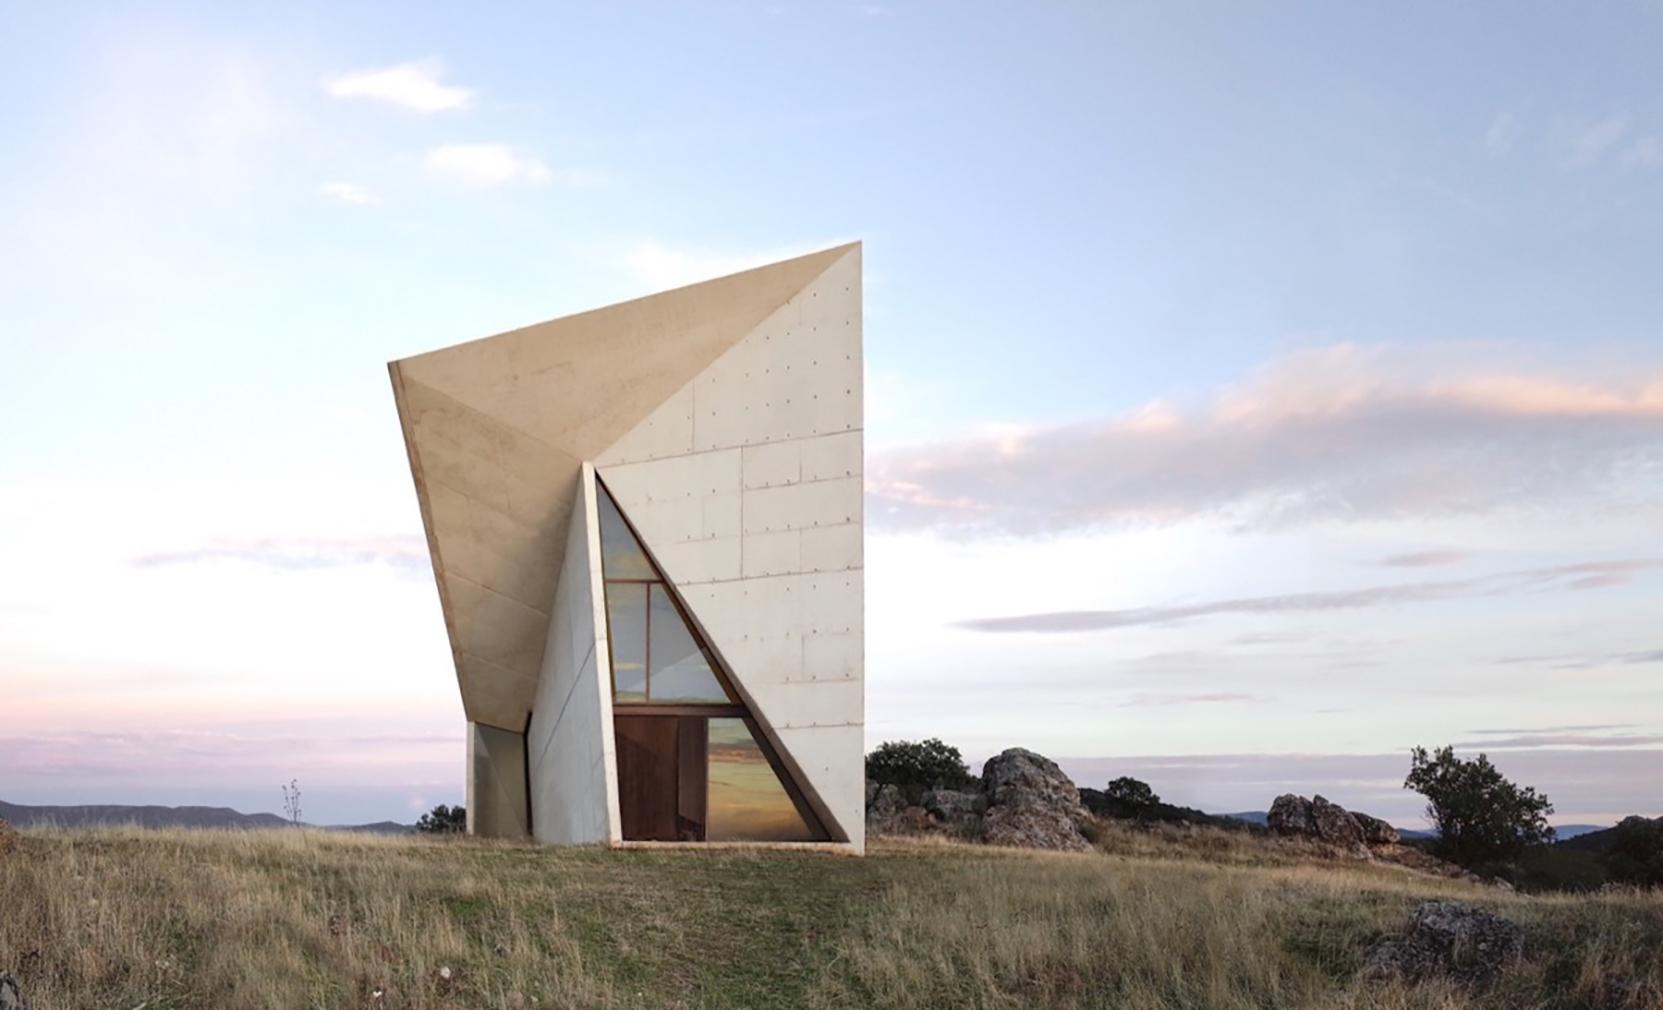 architecture chapel valleaceron_sancho juan carlos sancho S.M.A.O